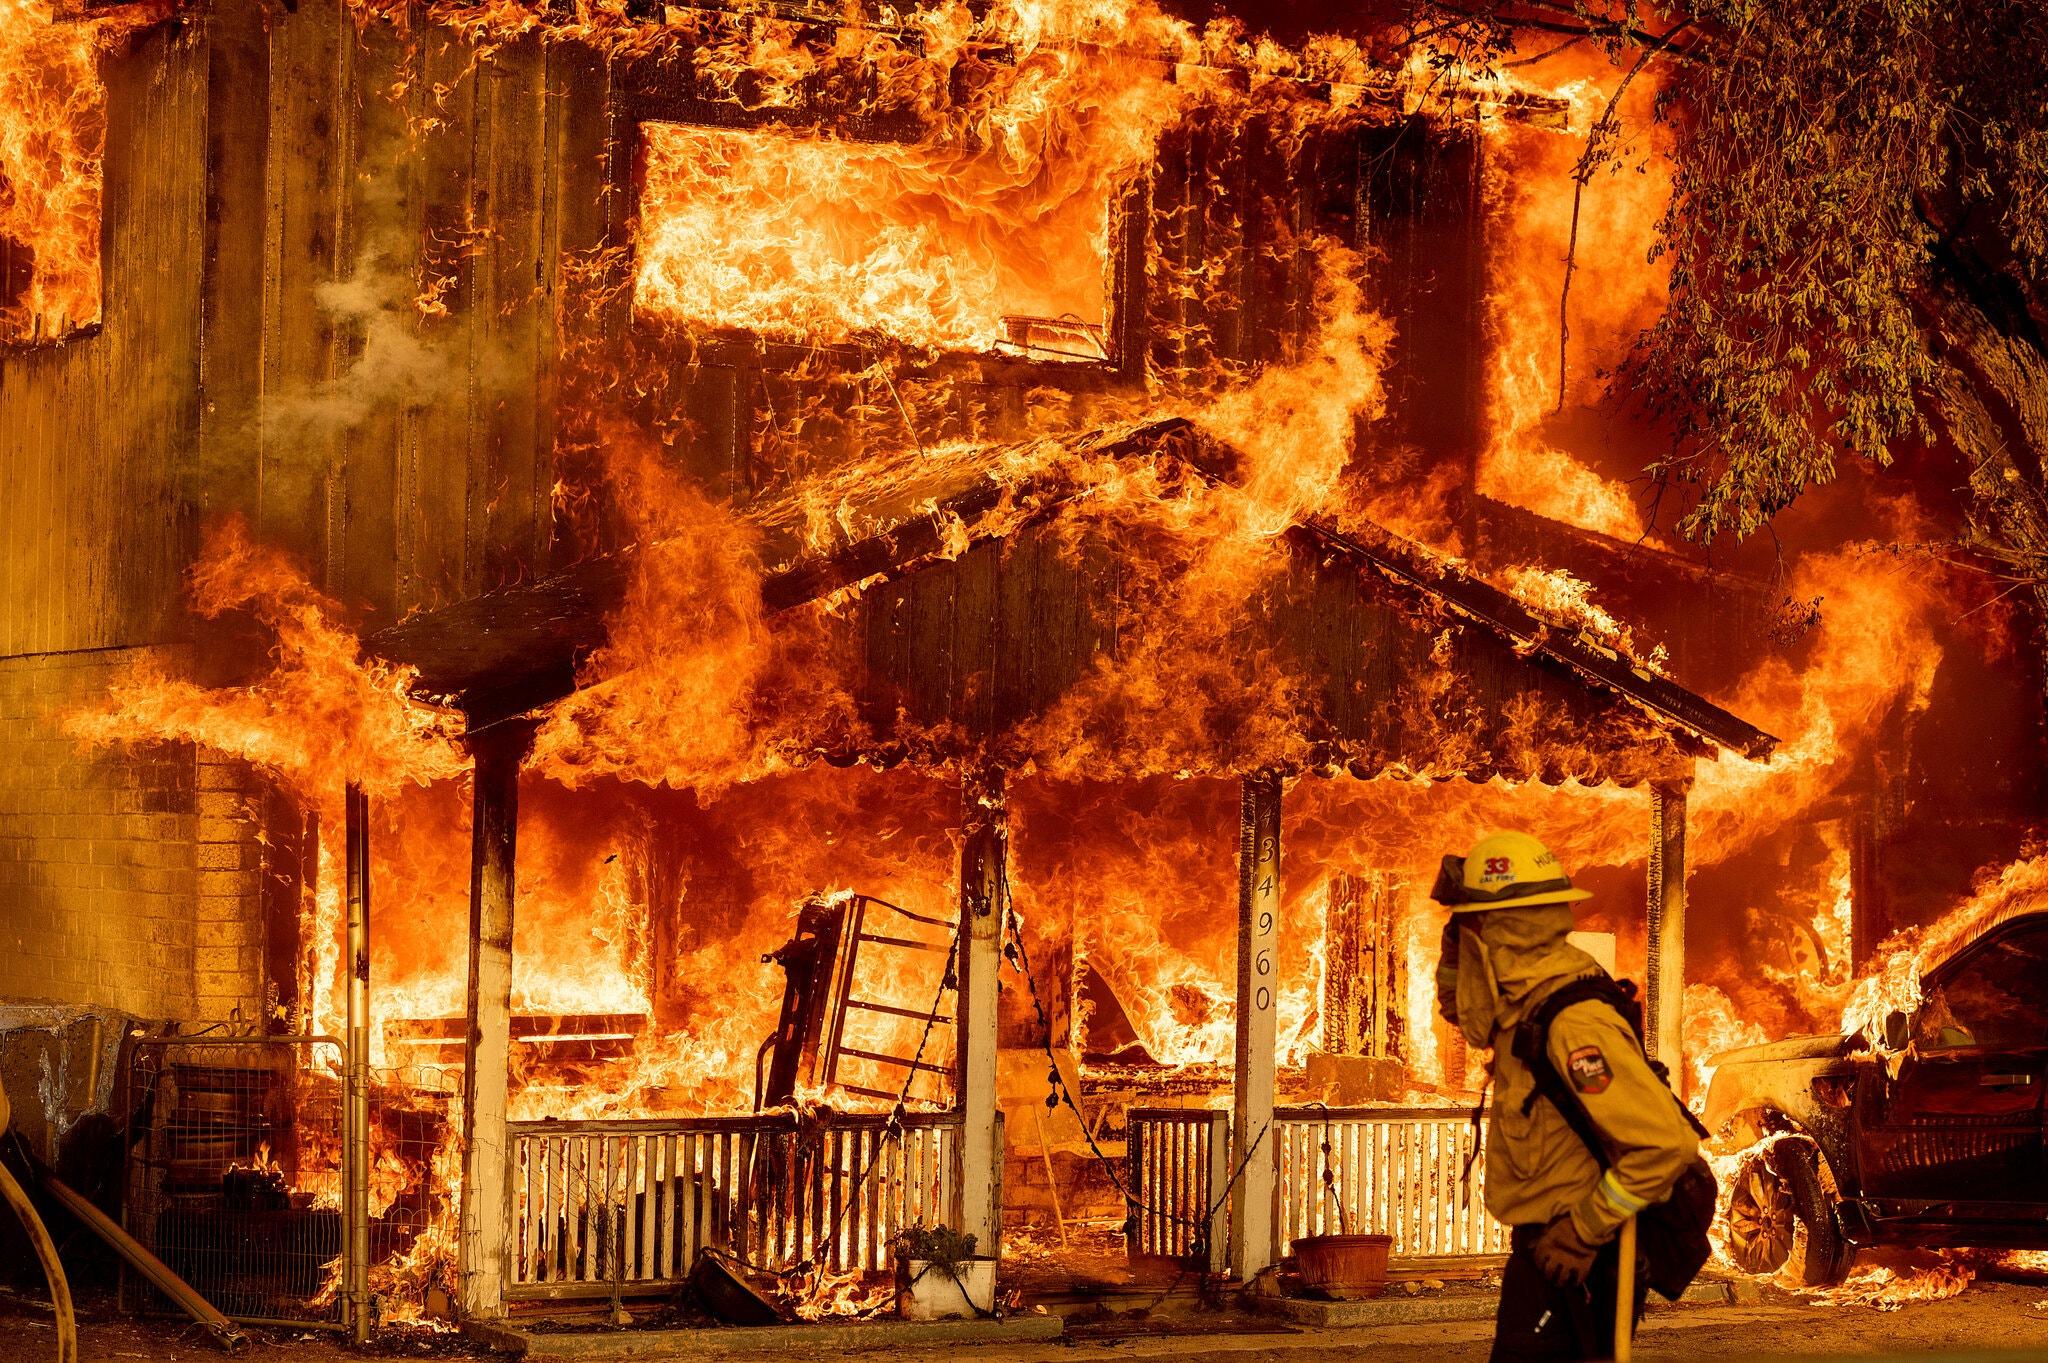 Building_on_Fire.jpg